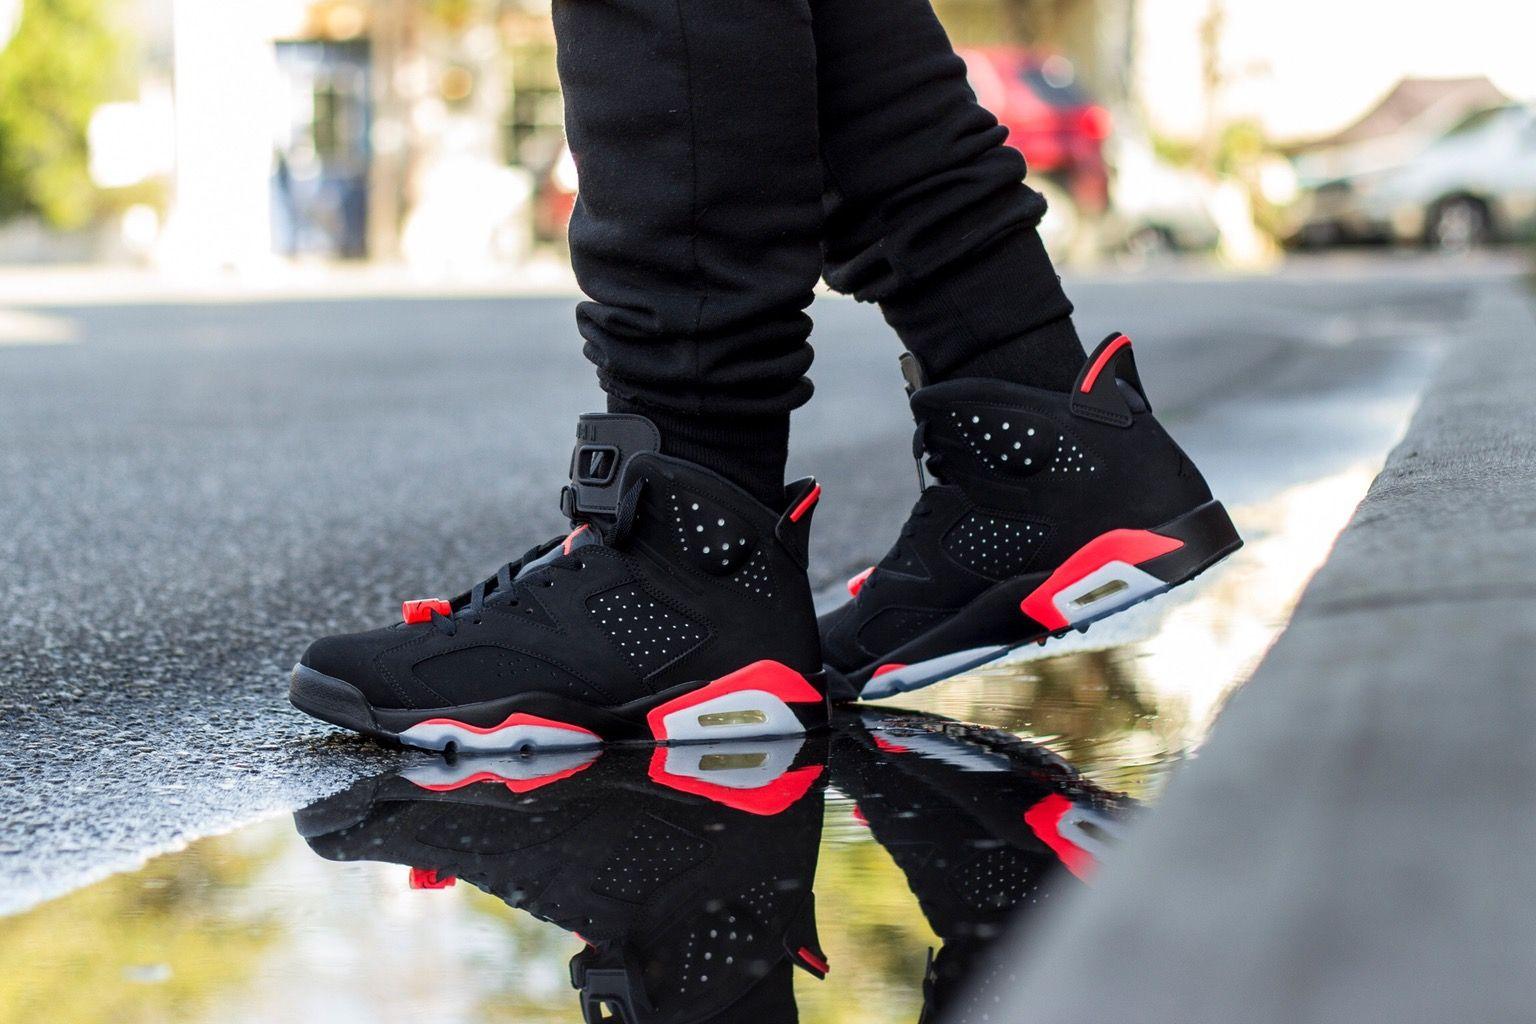 Air Jordan 6 Retro Black Infrared Air Jordans Sneaker Collection Jordans